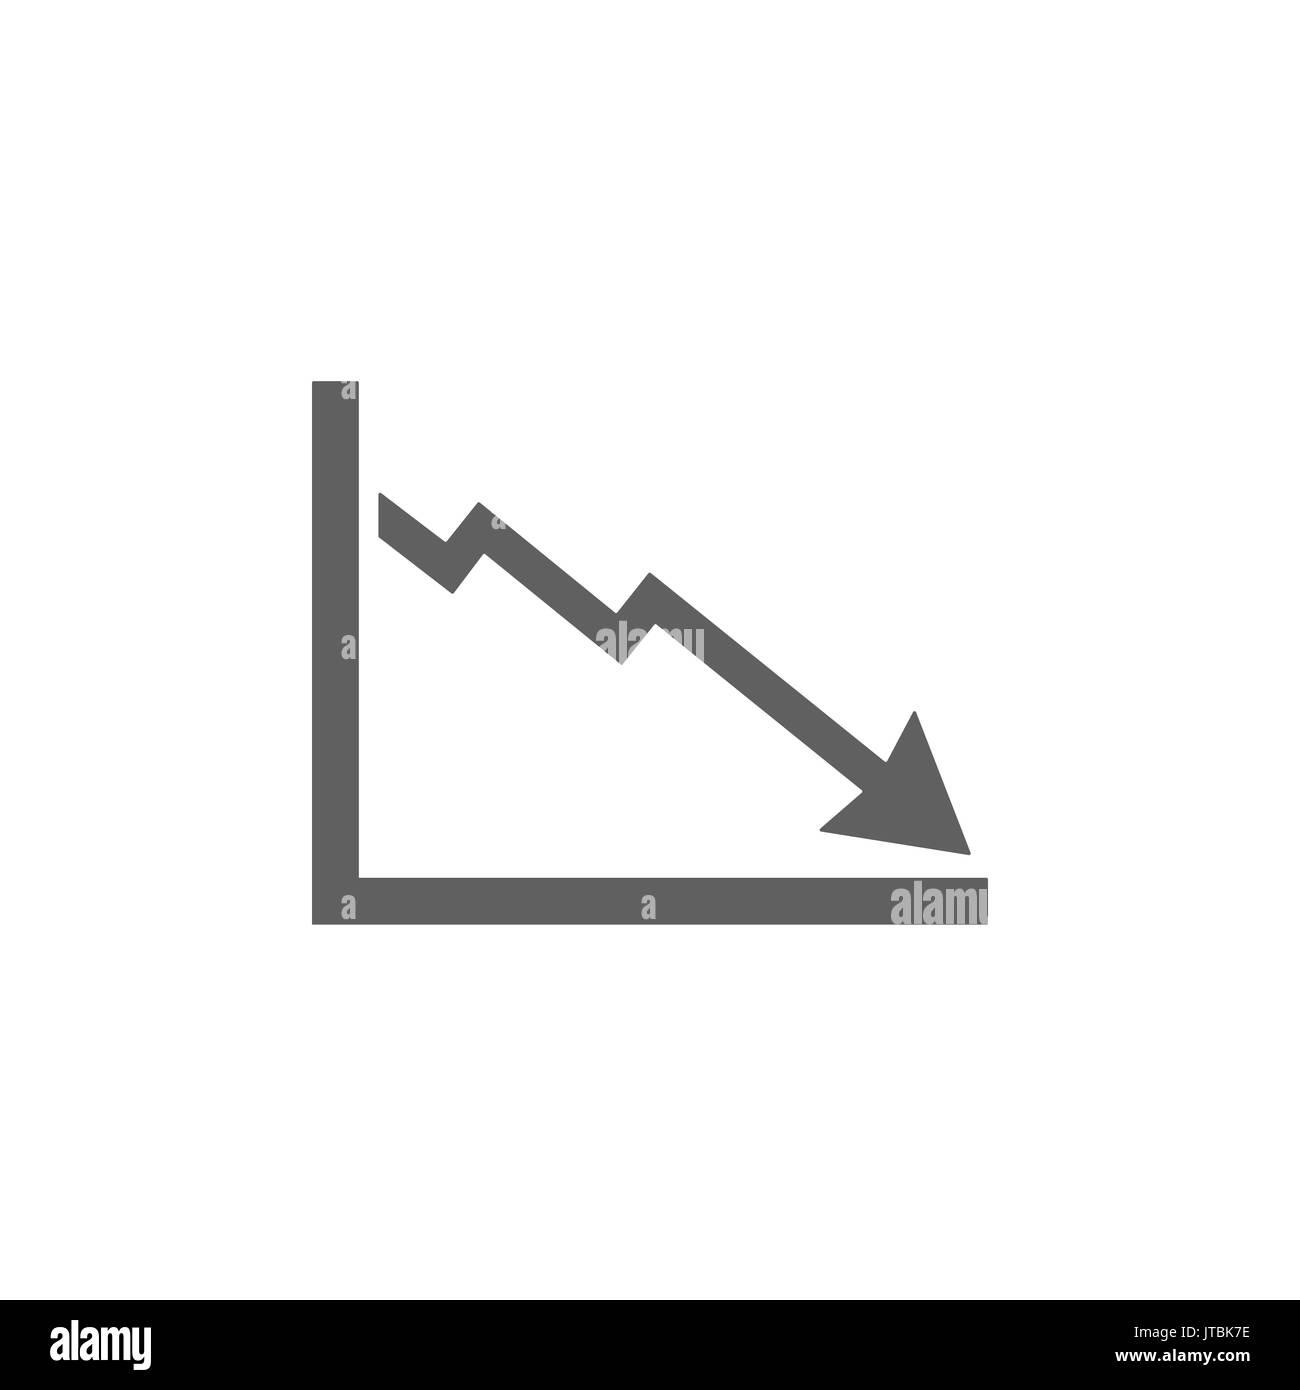 Bankruptcy chart icon on white background - Stock Image